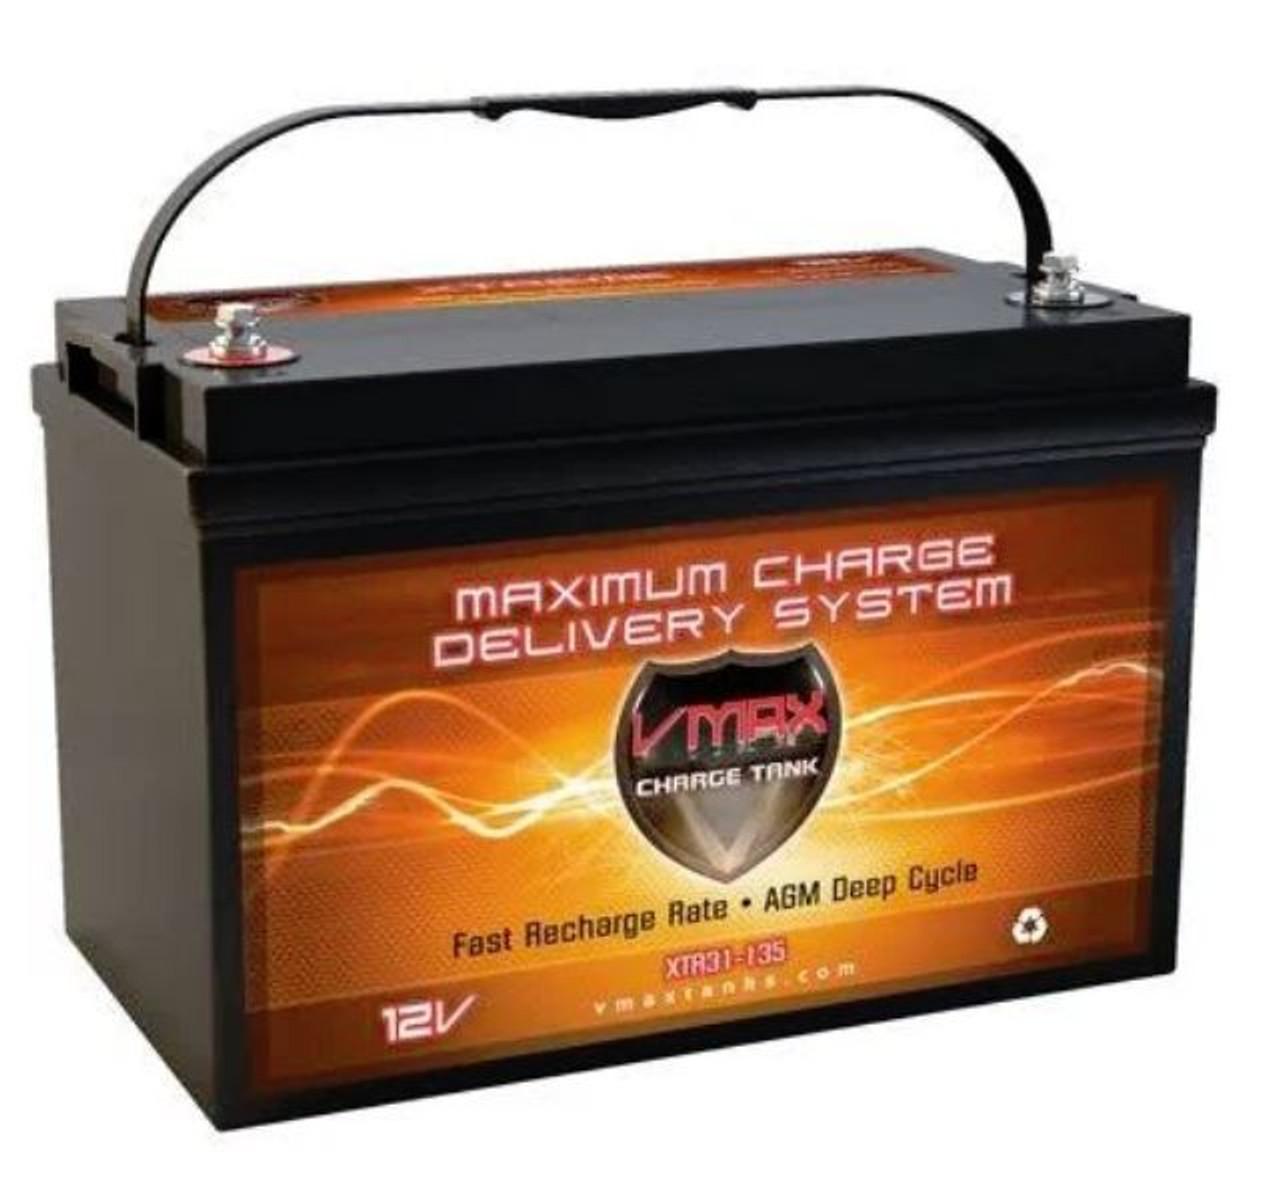 VMAX Charge Tank XTR31-135 12 Volts 135AH Deep Cycle, XTREME AGM Battery